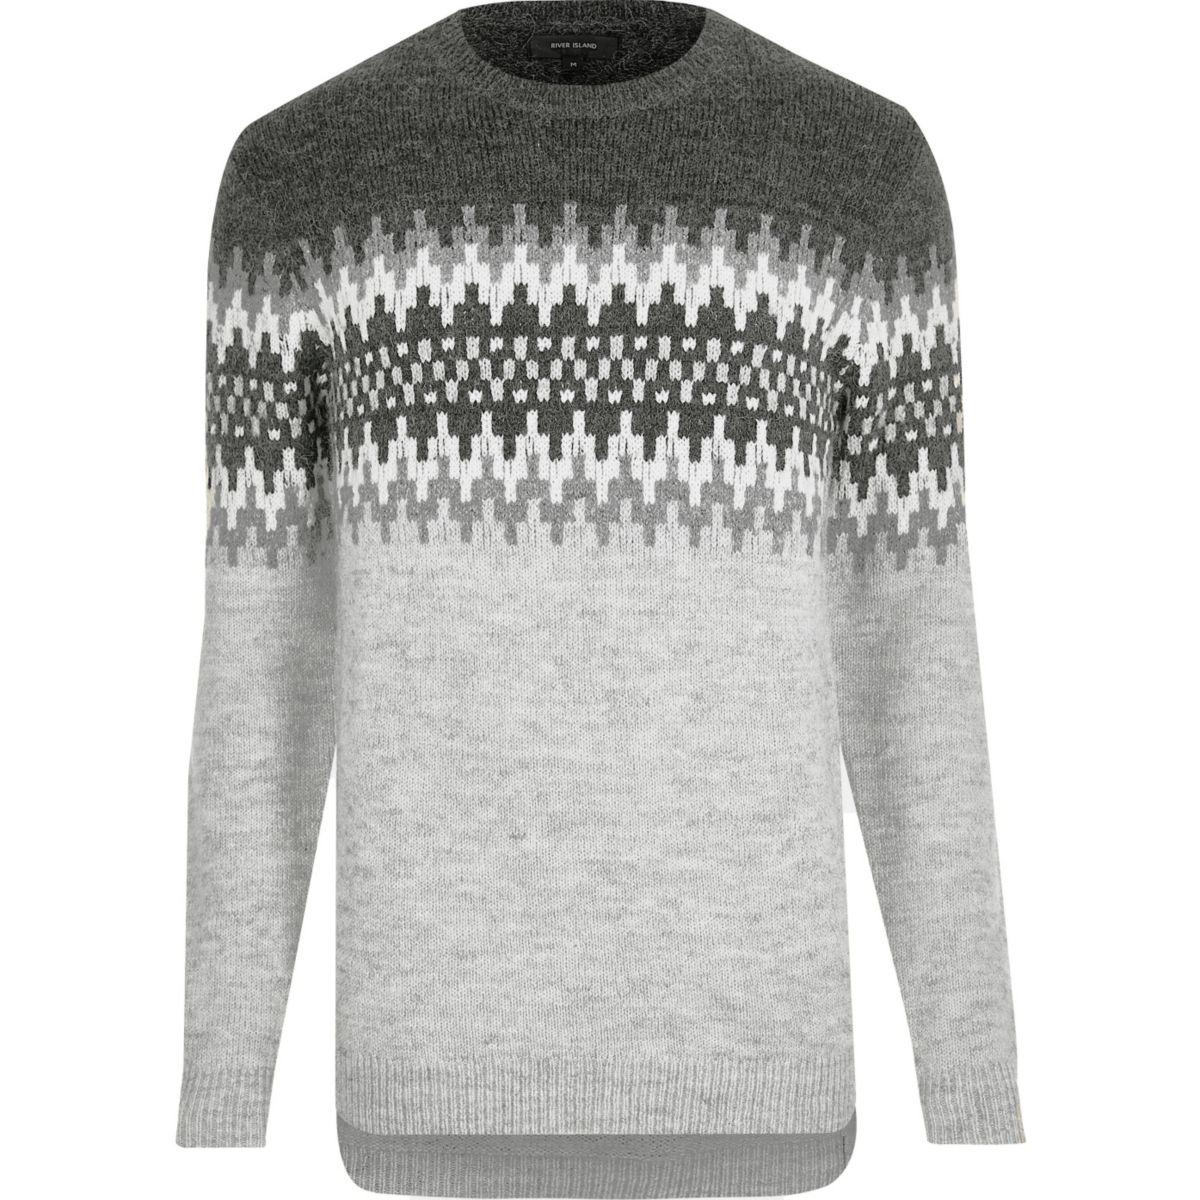 Light grey fairisle knit Christmas jumper